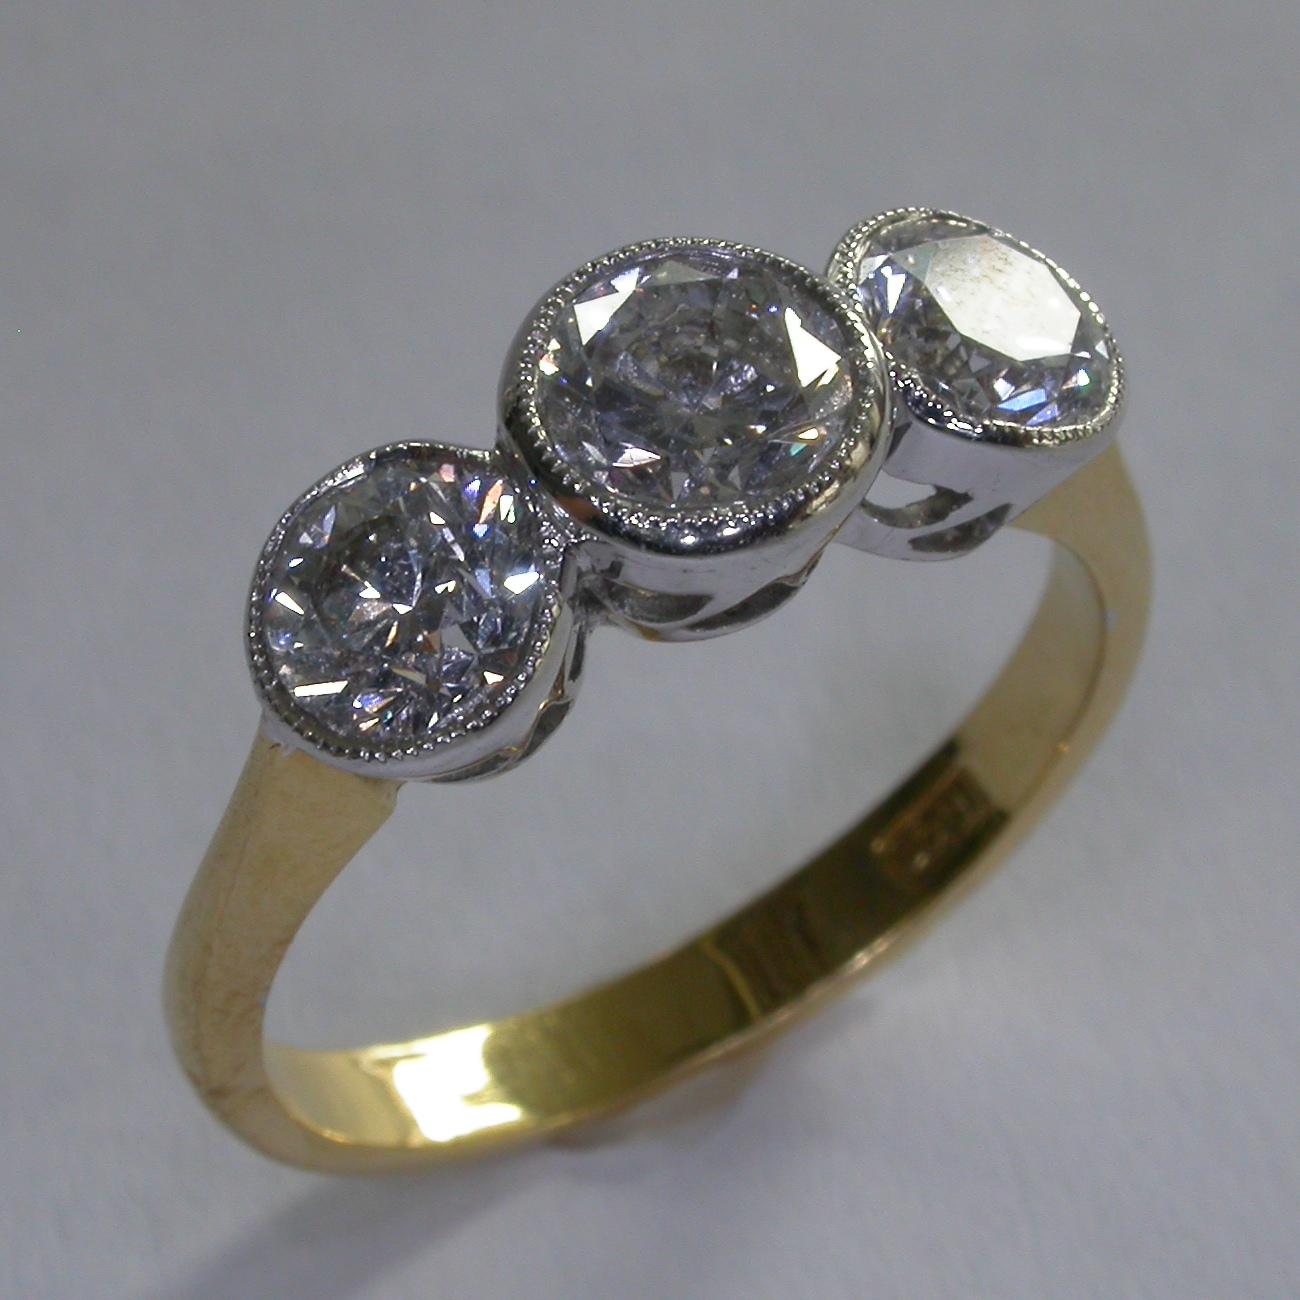 Diamond Engagement Ring - #3864